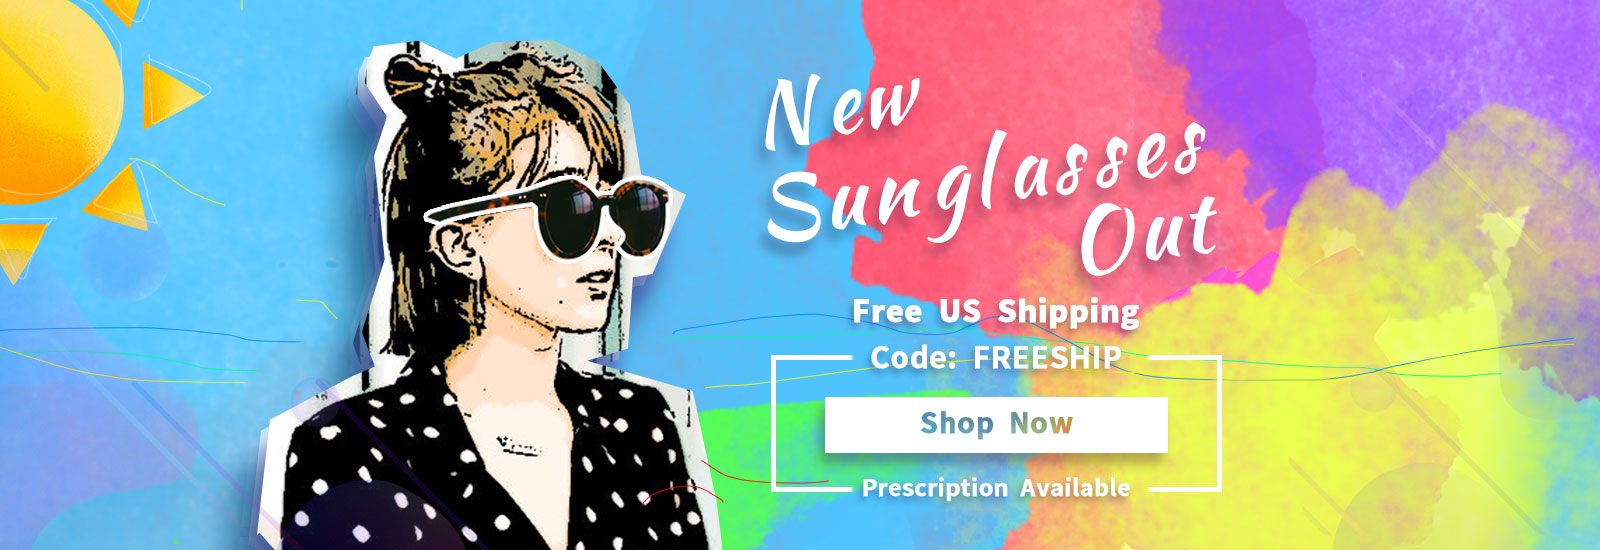 2e9bd4ba9ceb Firmoo.com - Your Preferred Online Eyewear Store - Glasses ...